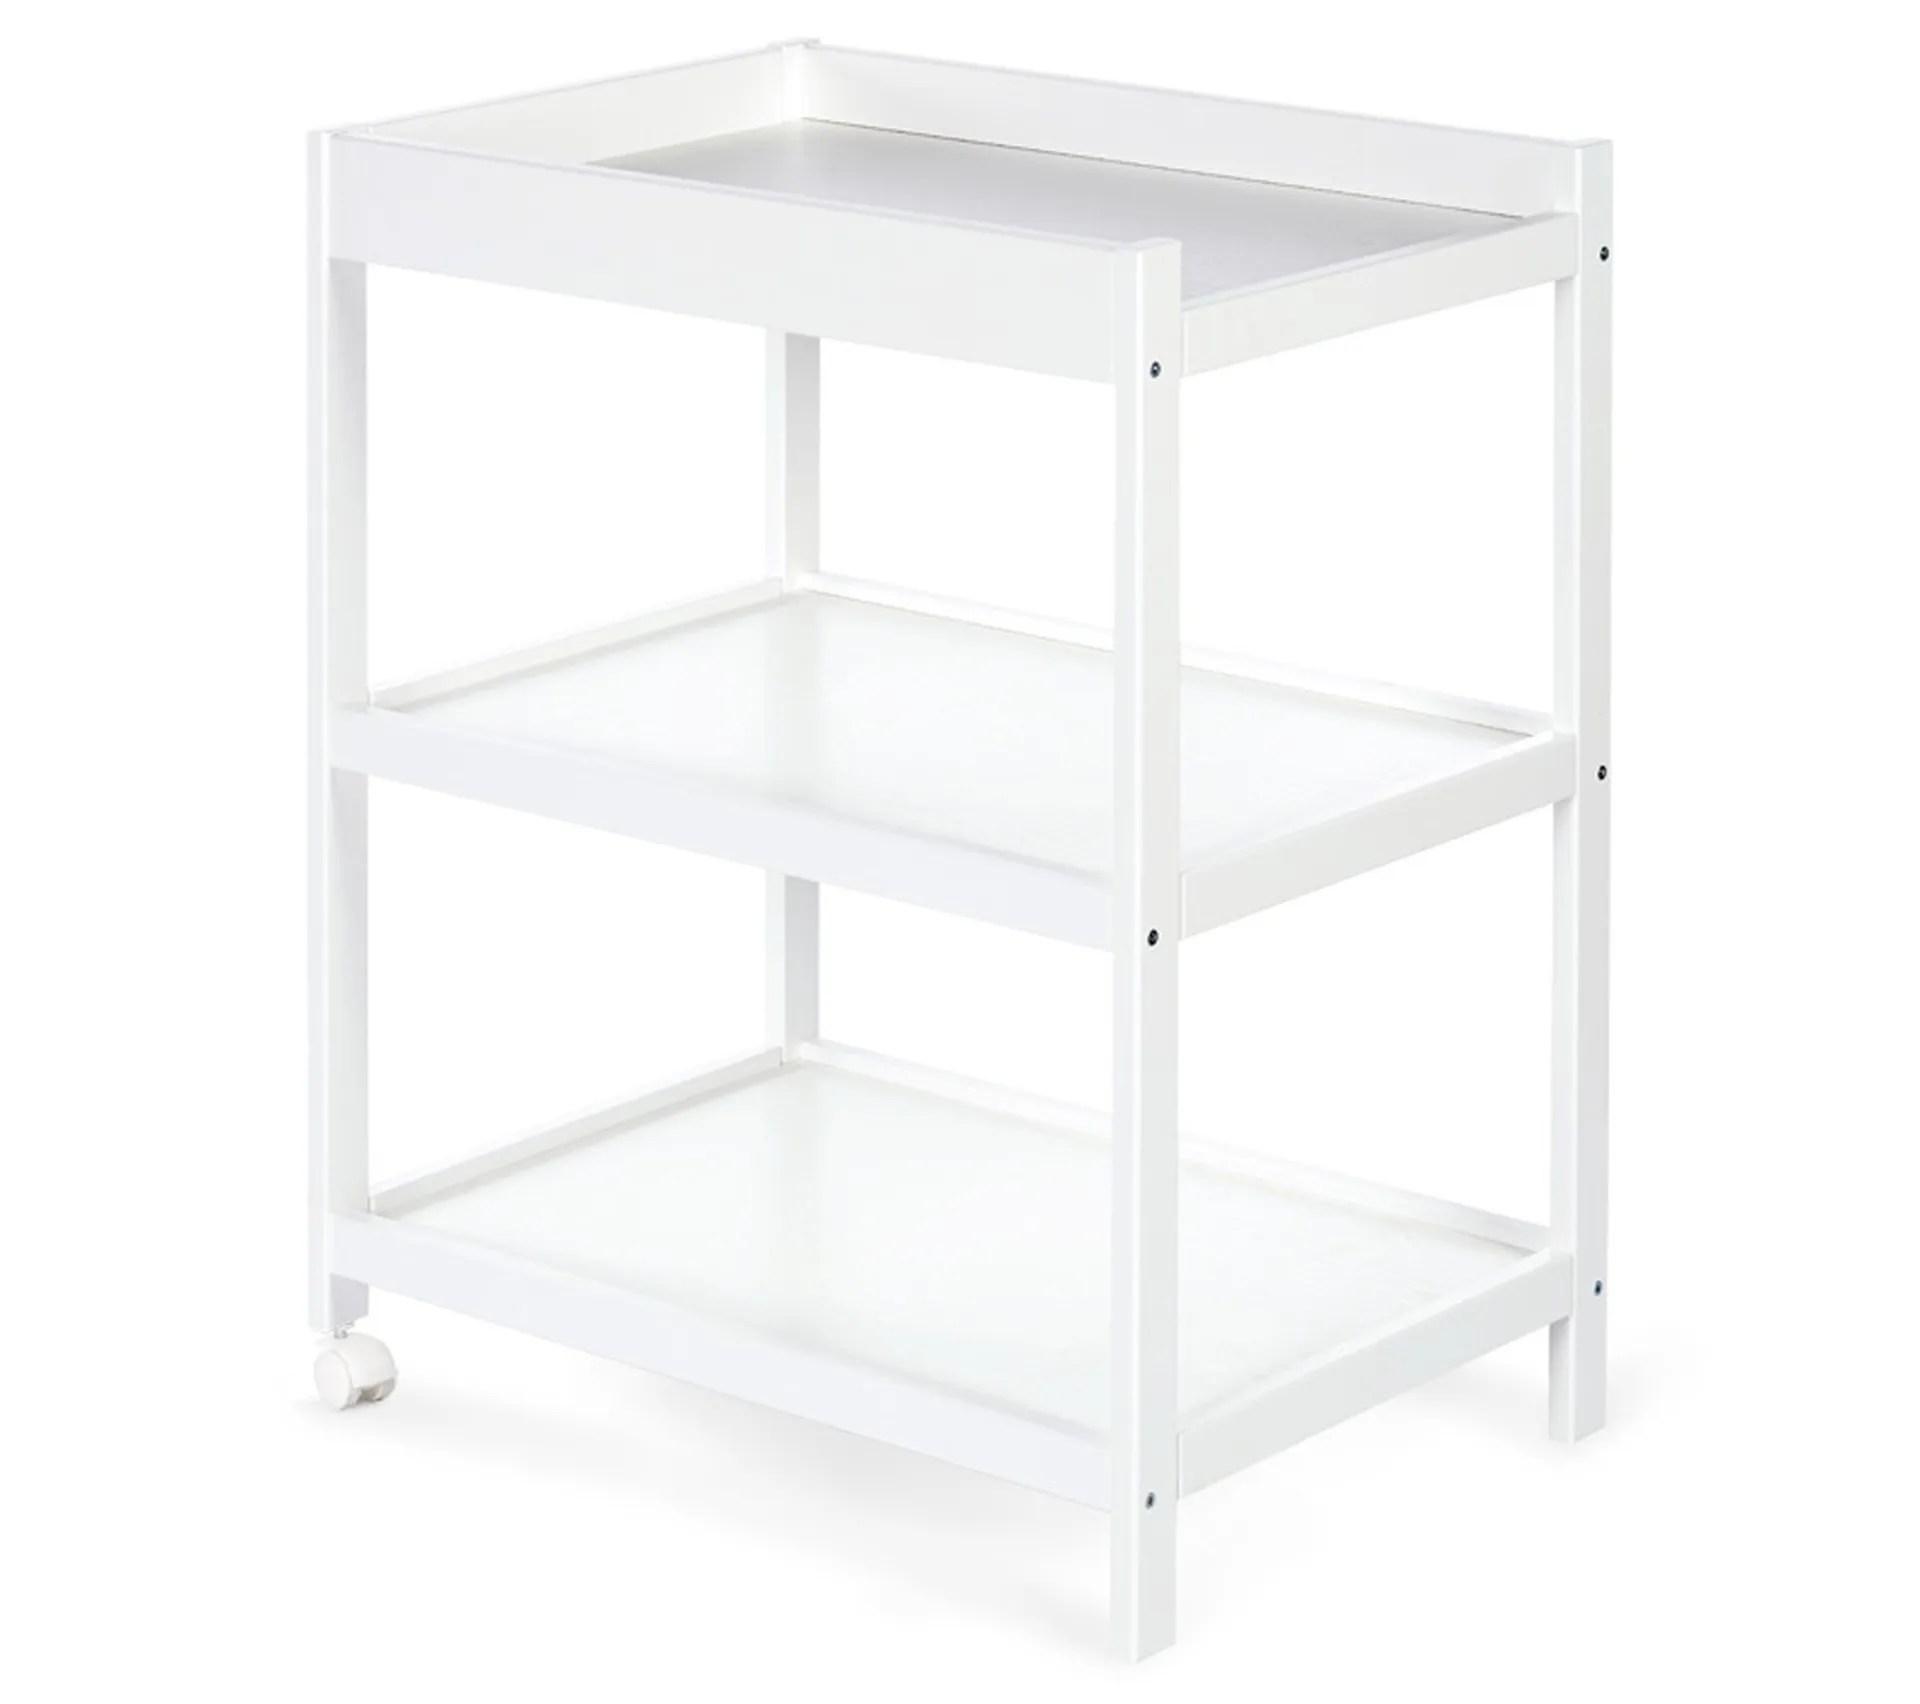 emma table a langer en bois avec etageres blanc